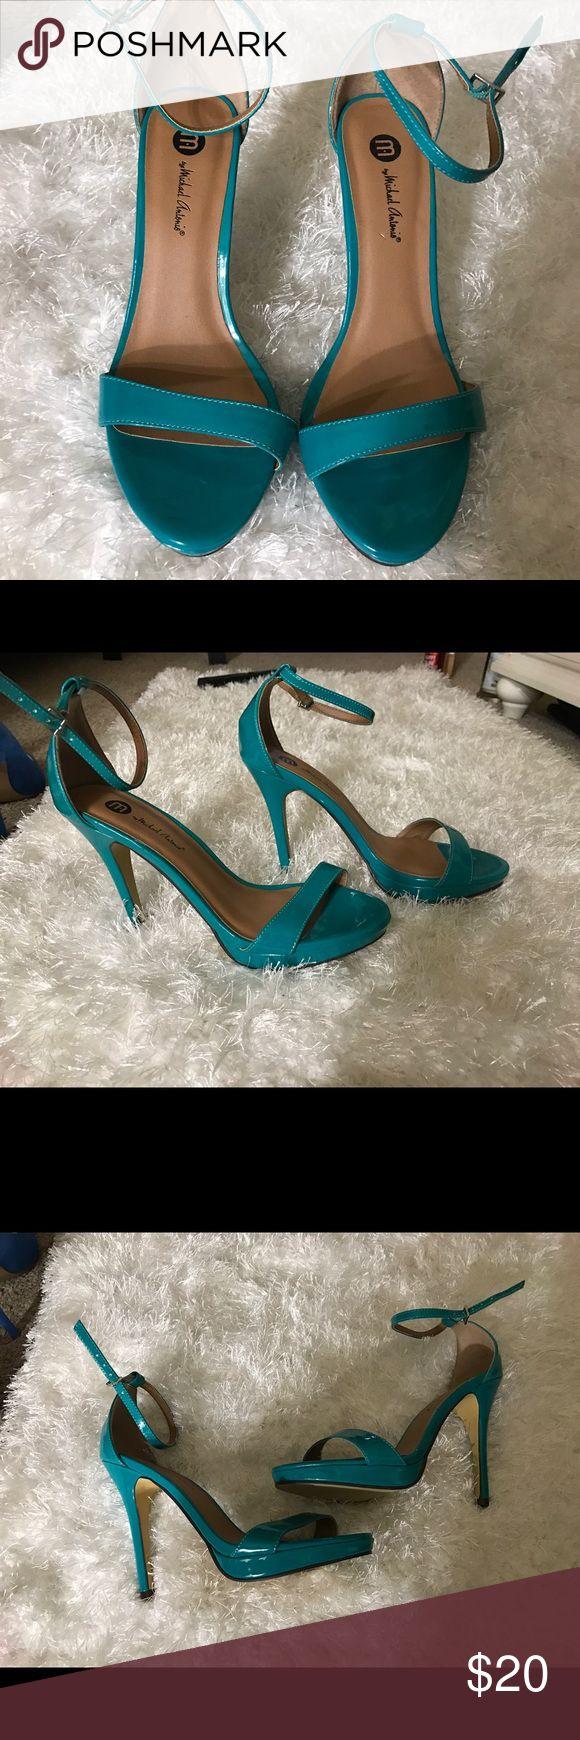 Blue sandal heels Blue strap high heel sandals brand new never worn perfect for summer no box Michael Antonio Shoes Heels